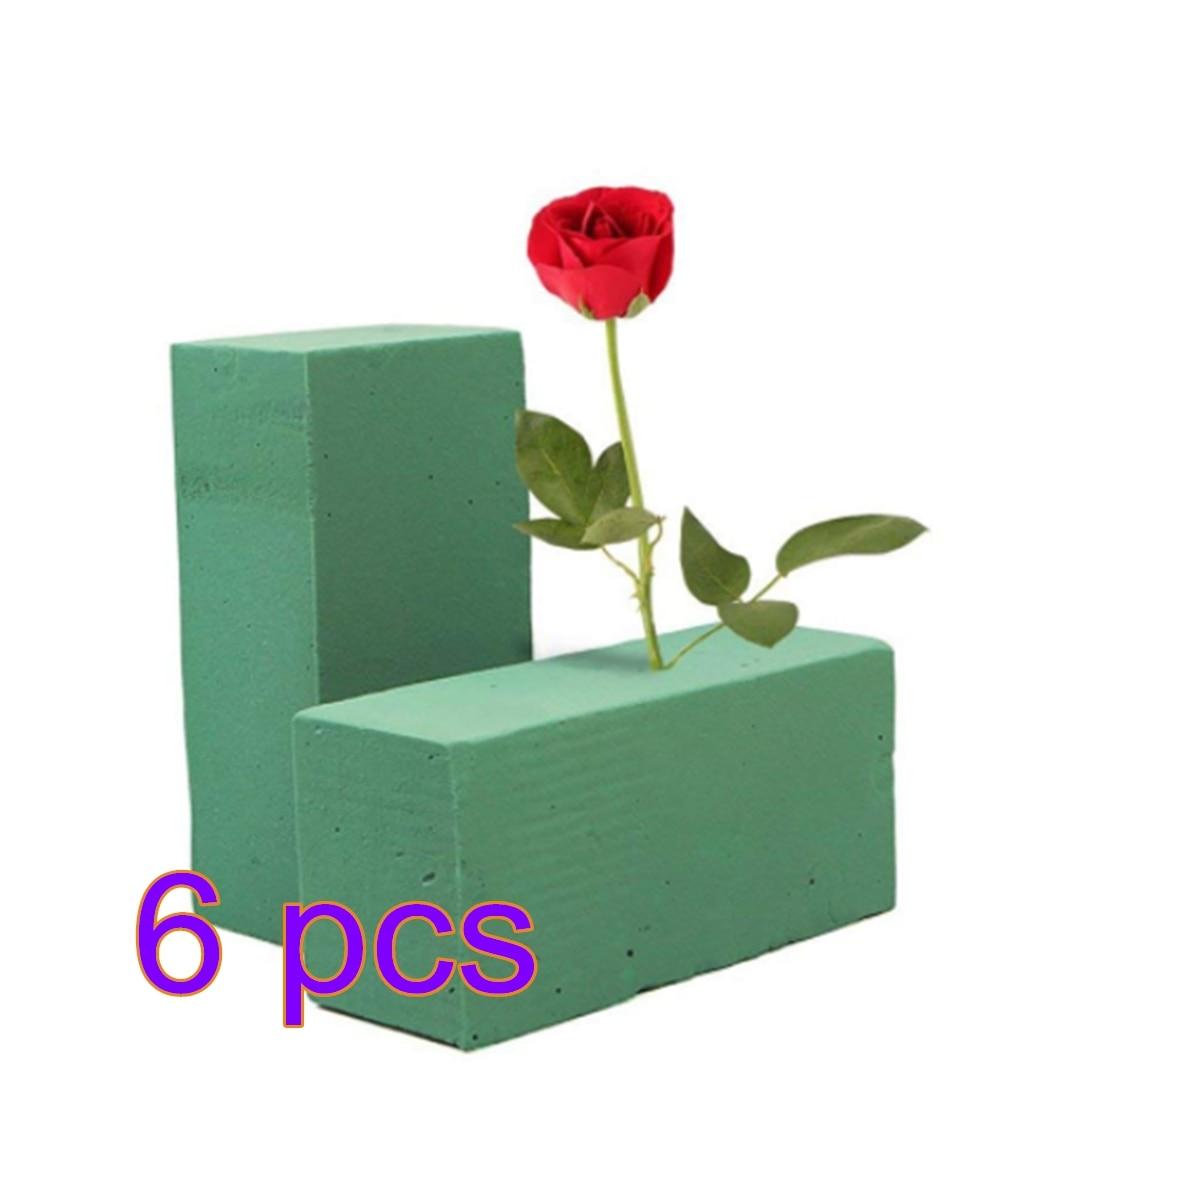 6Pcs Floral Foam Bricks Florist Flower Styrofoam Bricks Applied Dry Or Wet For Fresh Cut Arrangements For Adult Children DIY Toy